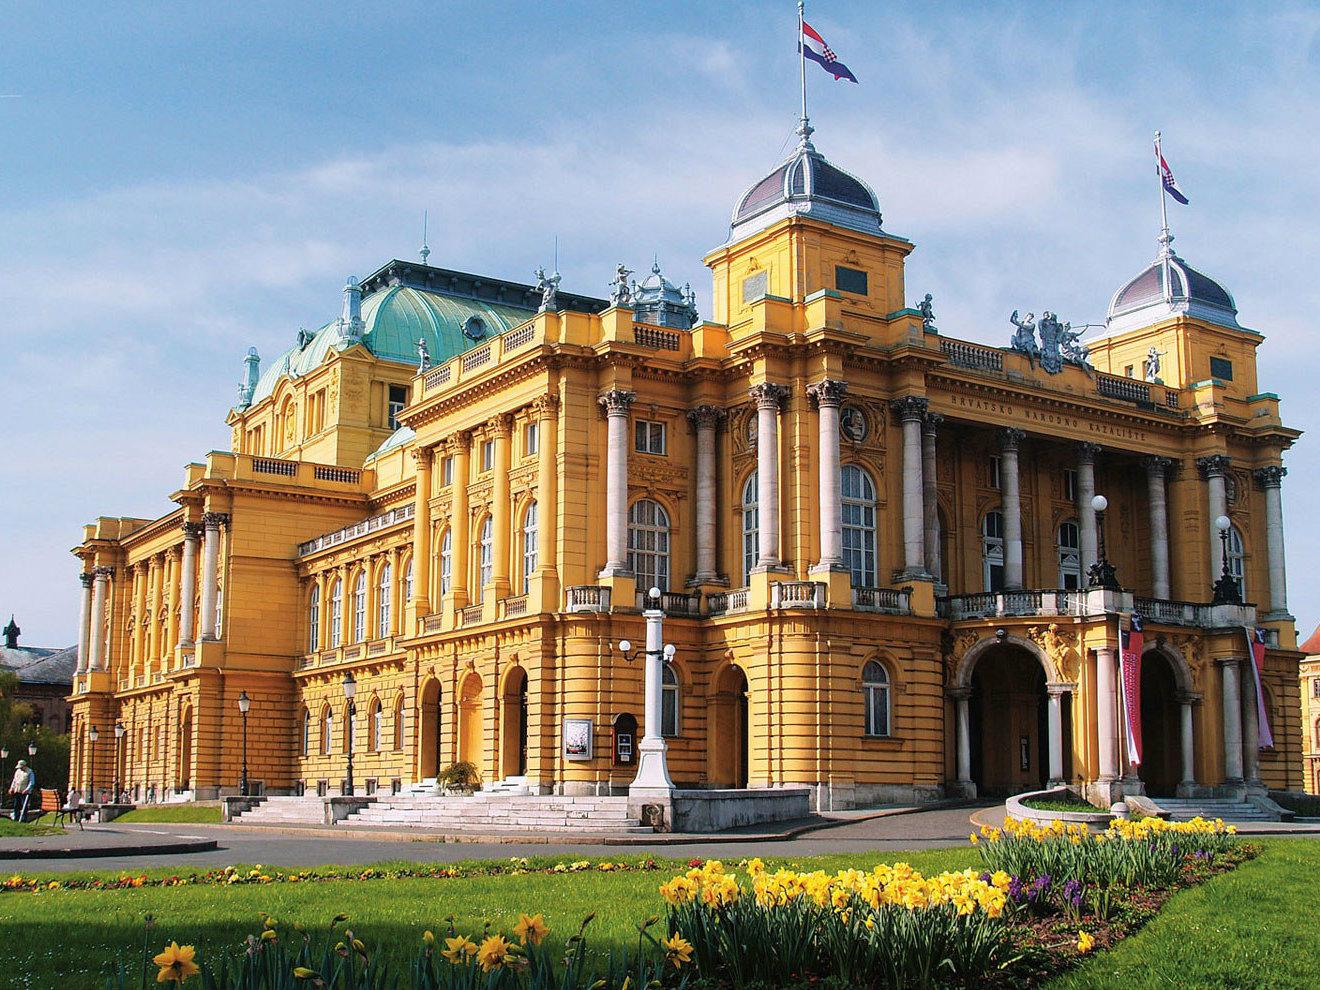 4-3-1600_National_Theater_Zagreb_klein-1500x990